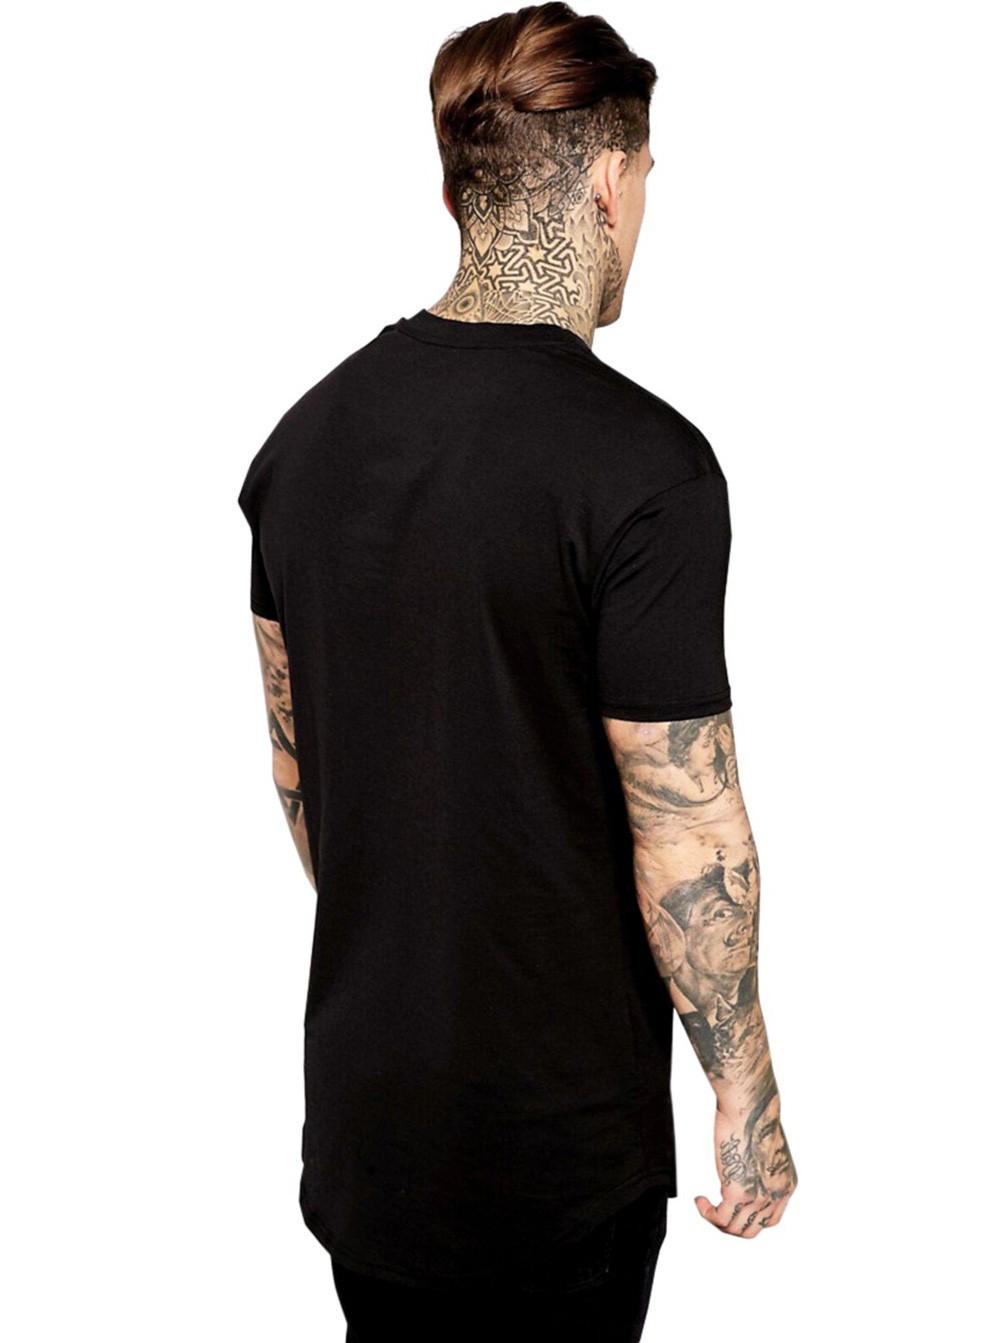 Camiseta Masculina Oversized Long Line Cristã Jesus Religiosa Cruz ER_111